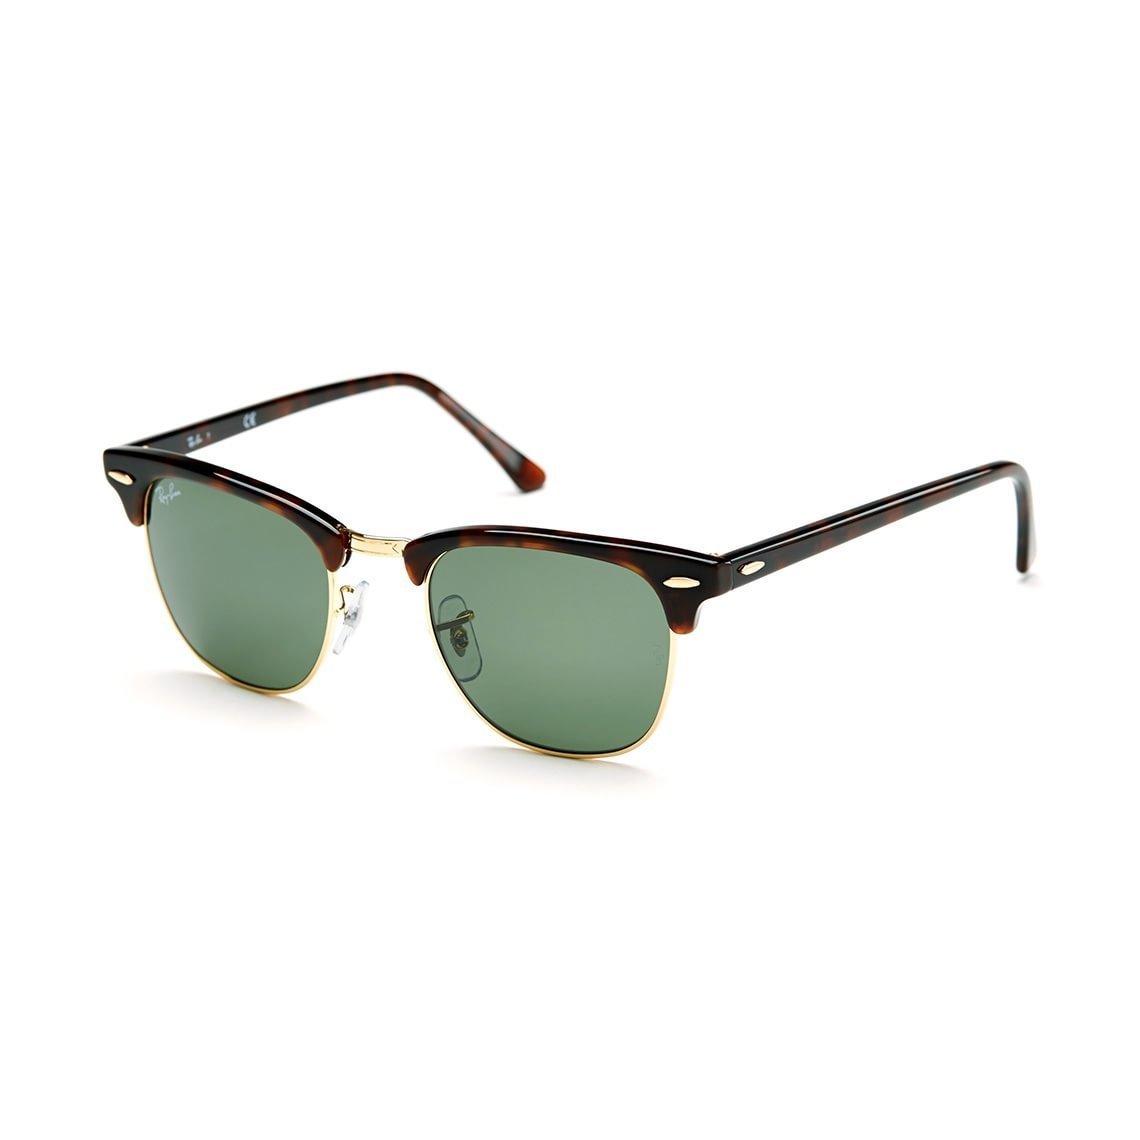 ec06bccb6e6c france shop ray ban clubmaster rb 3016 unisex tortoise frame green classic lens  sunglasses free shipping